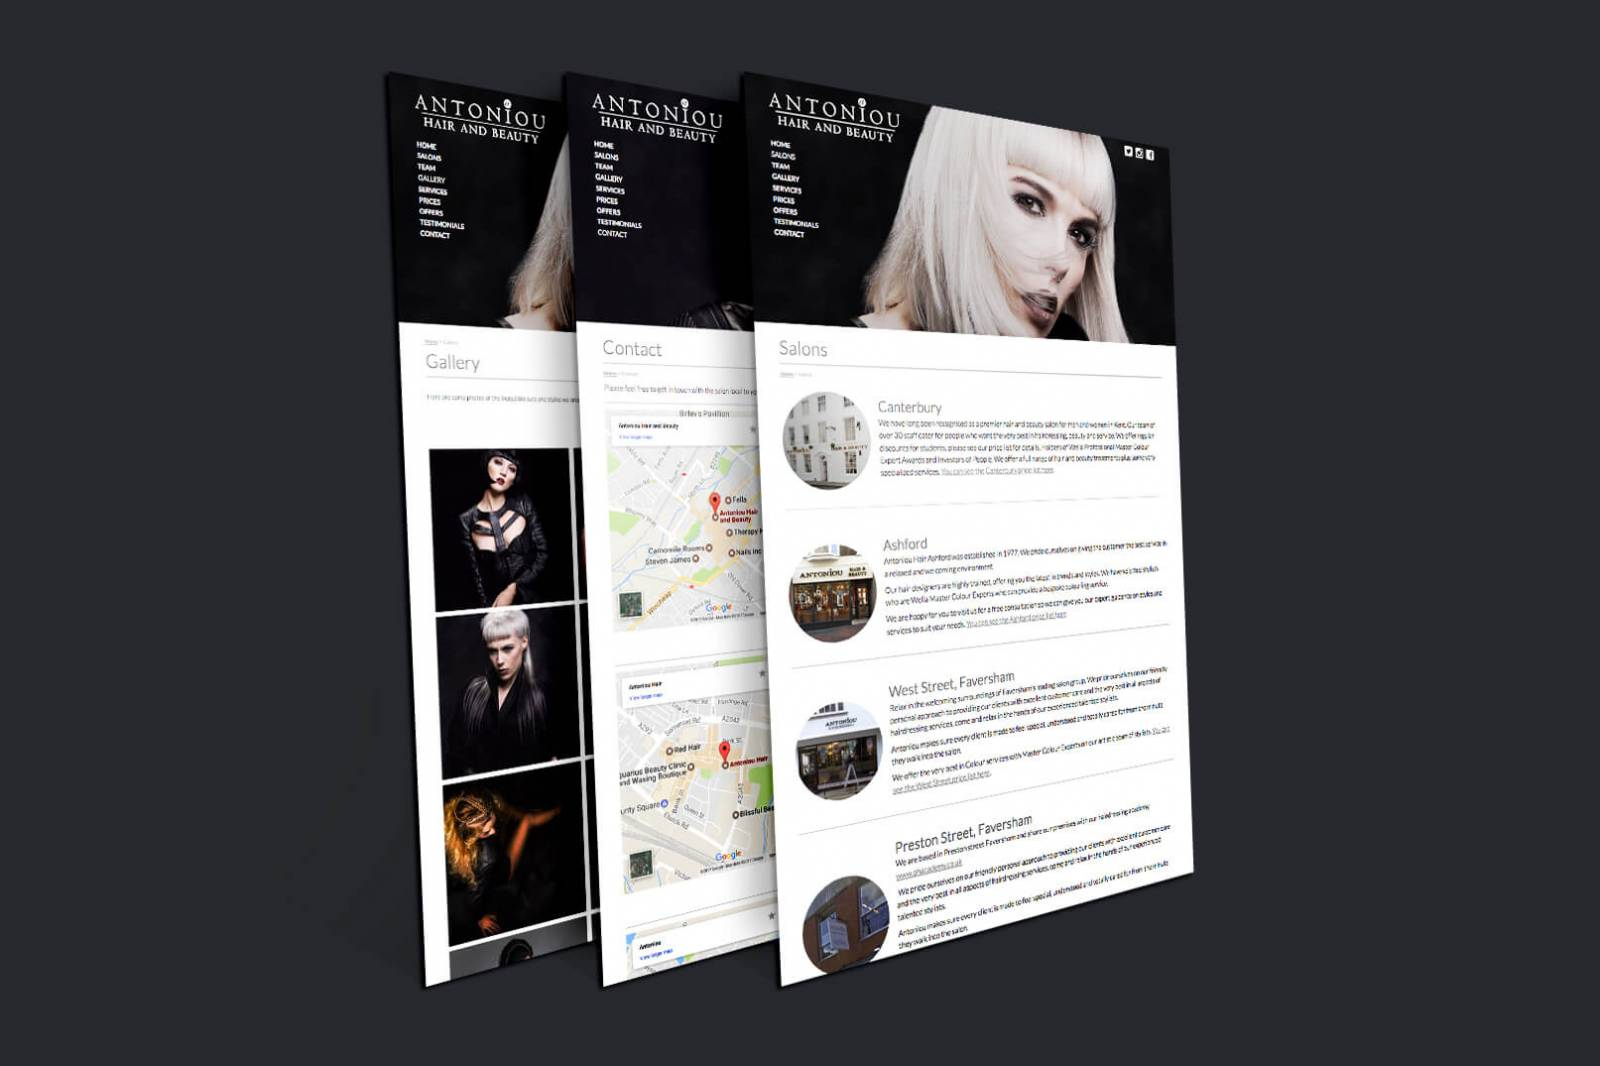 Antoniou-poster-design-agency-graphic-design-canterbury.jpg